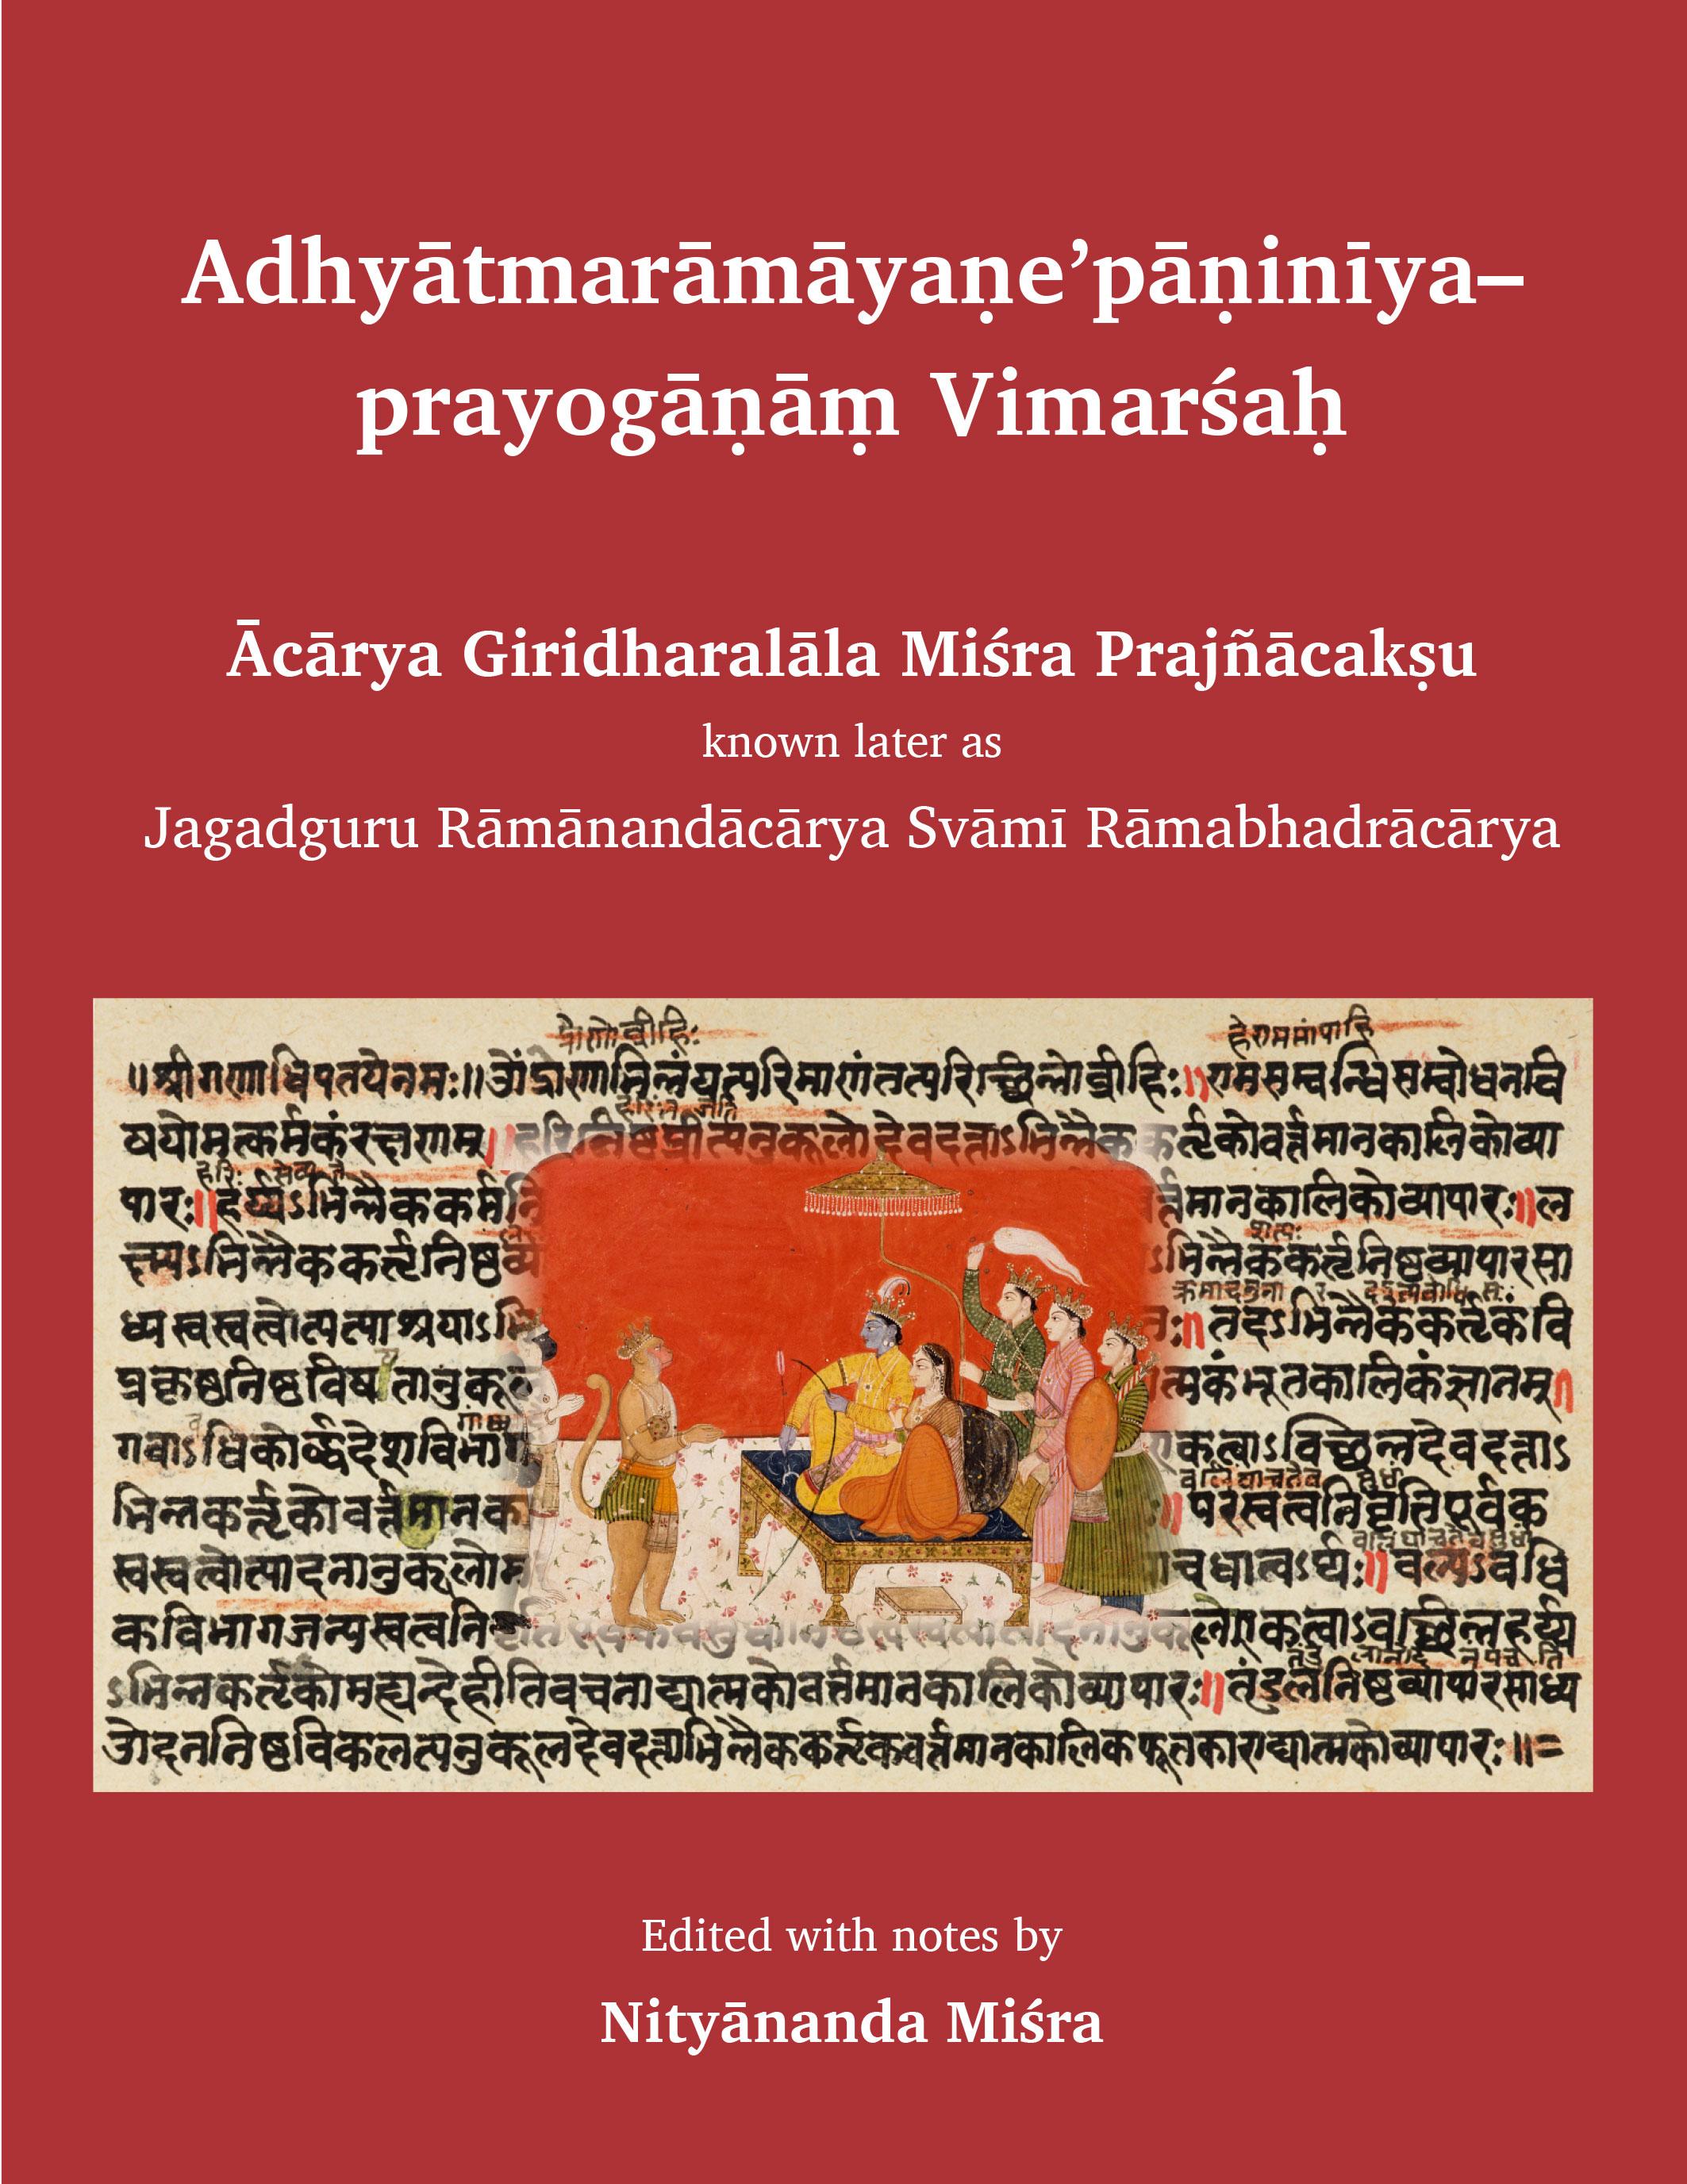 Adhyatma Ramayaneepaniniya Prayoganam Vimarsah Book